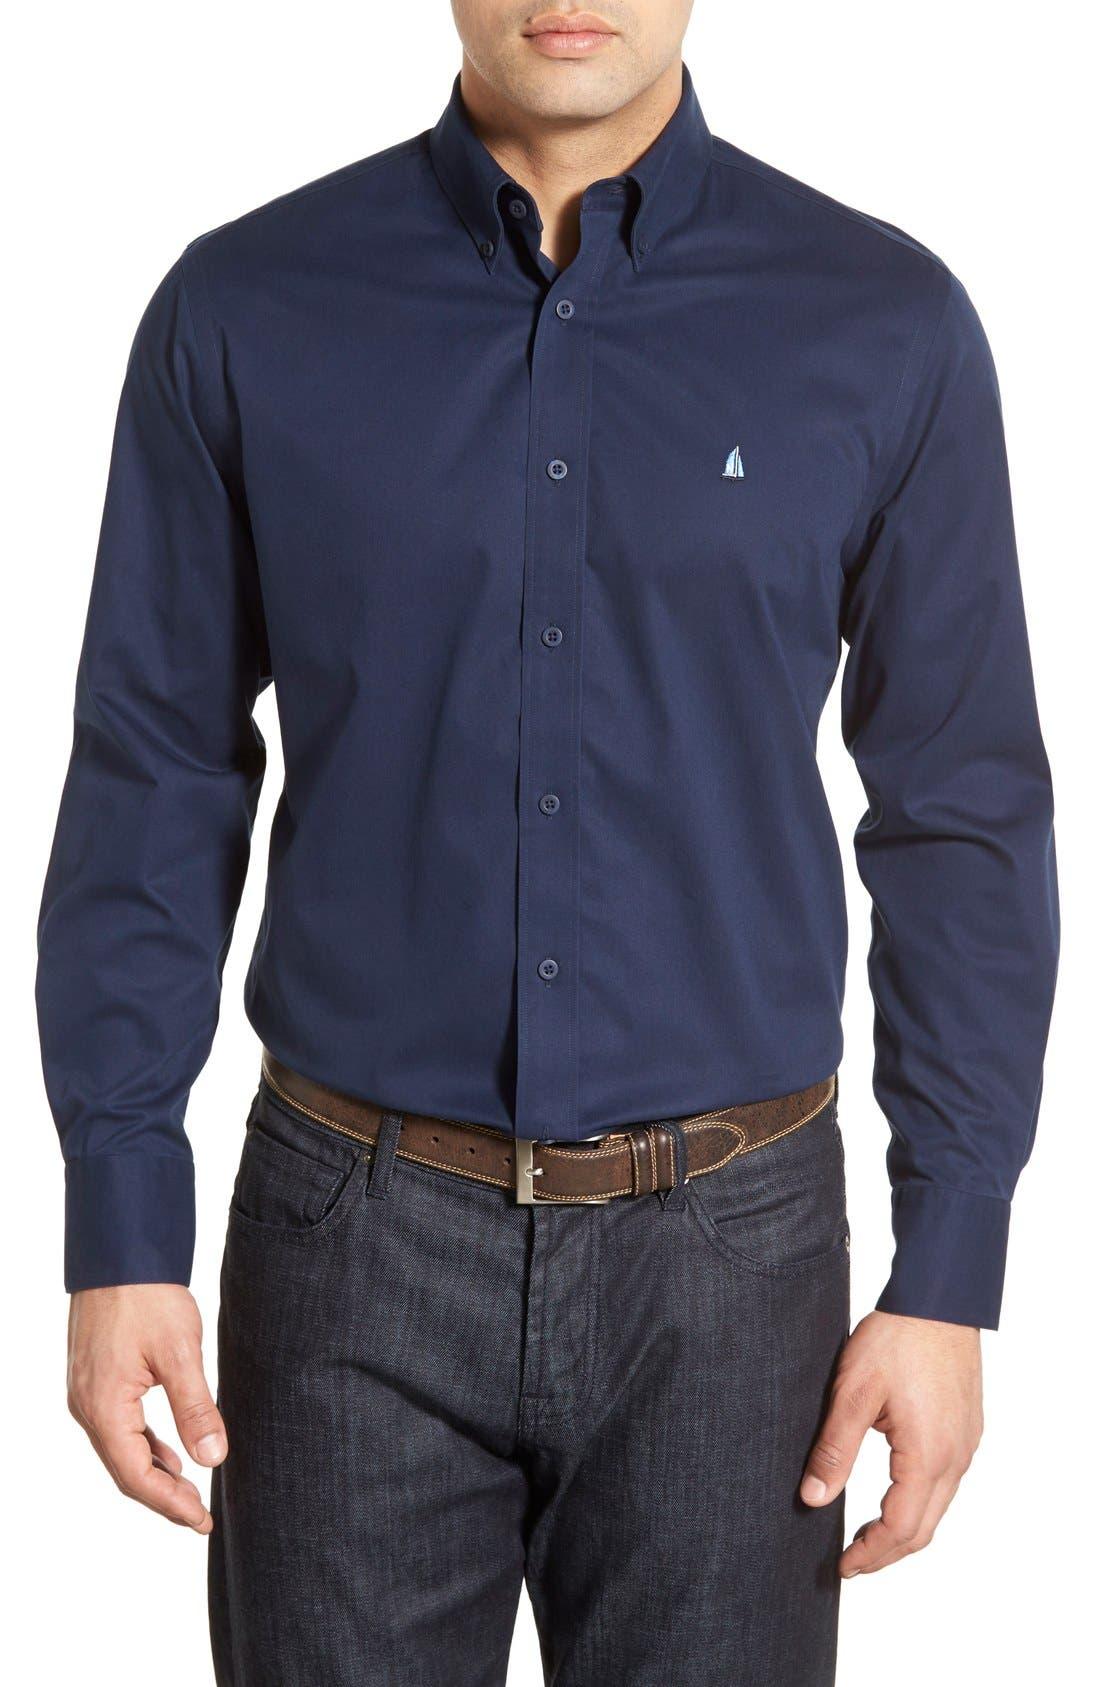 Main Image - Nordstrom Men's Shop Smartcare™ Traditional Fit Twill Boat Shirt (Regular & Tall)